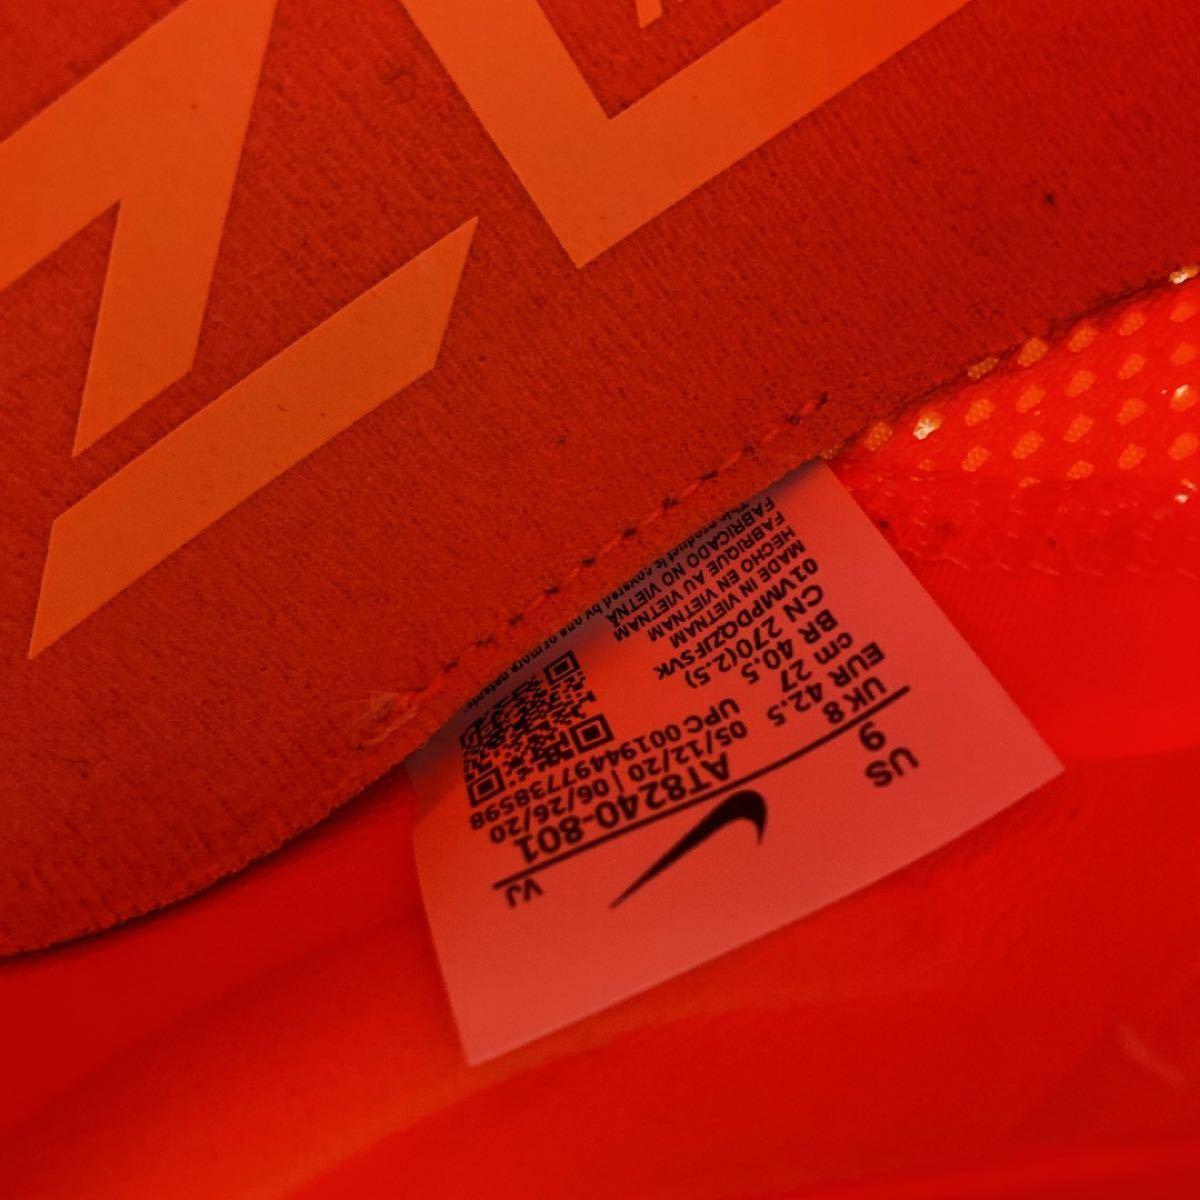 NIKE ZOOM FLY 3 ランニングシューズ ローカットスニーカー 27cm ORN